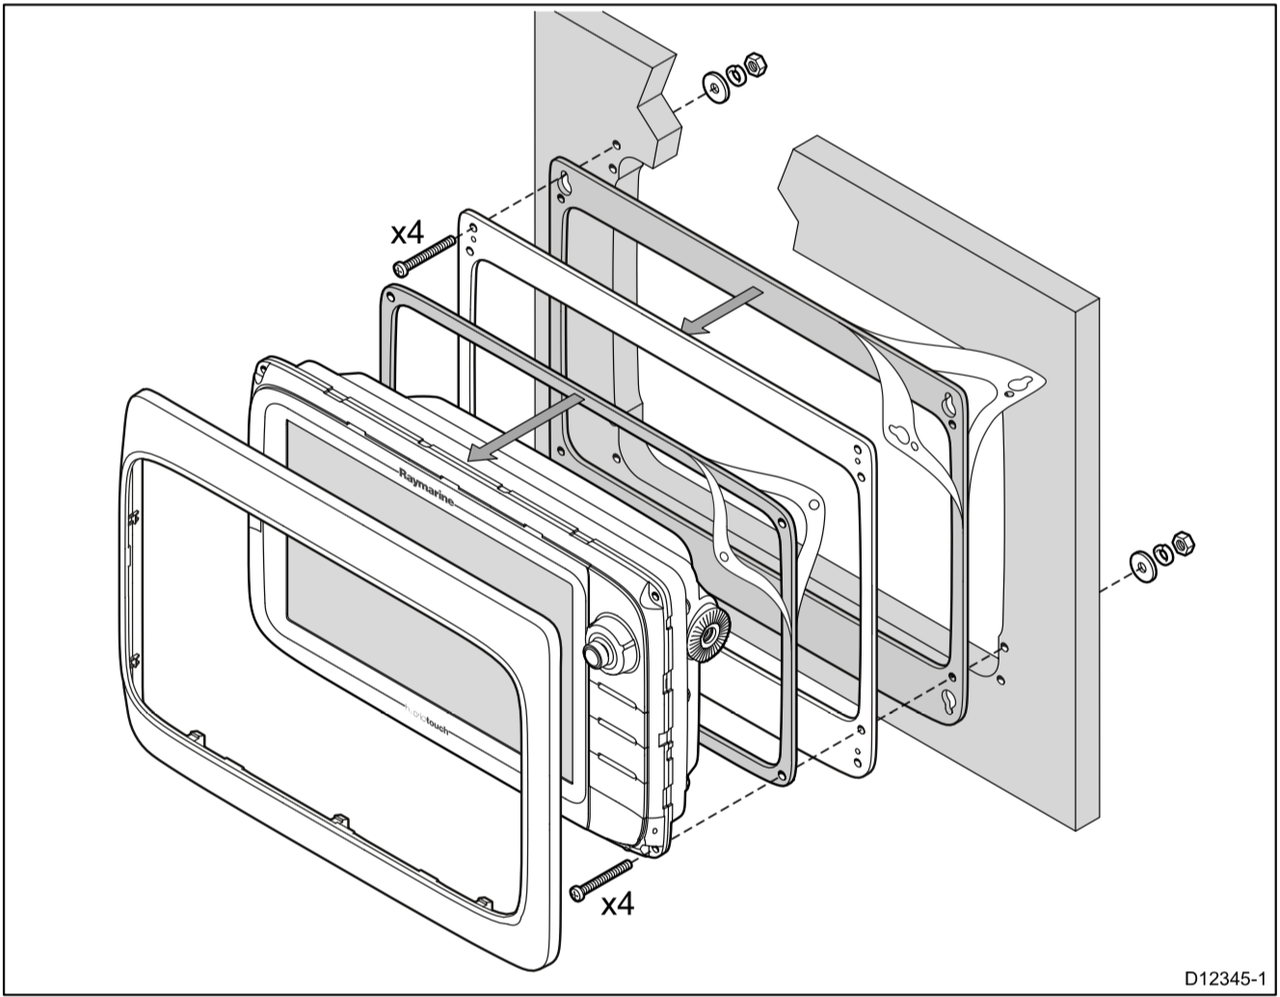 hight resolution of garmin 2010c chartplotter wiring diagrams wiring diagrams raymarine c9 e9 mounting adaptor kit for c80e80 cutout 86470 1437743912 1280 1280 c 2